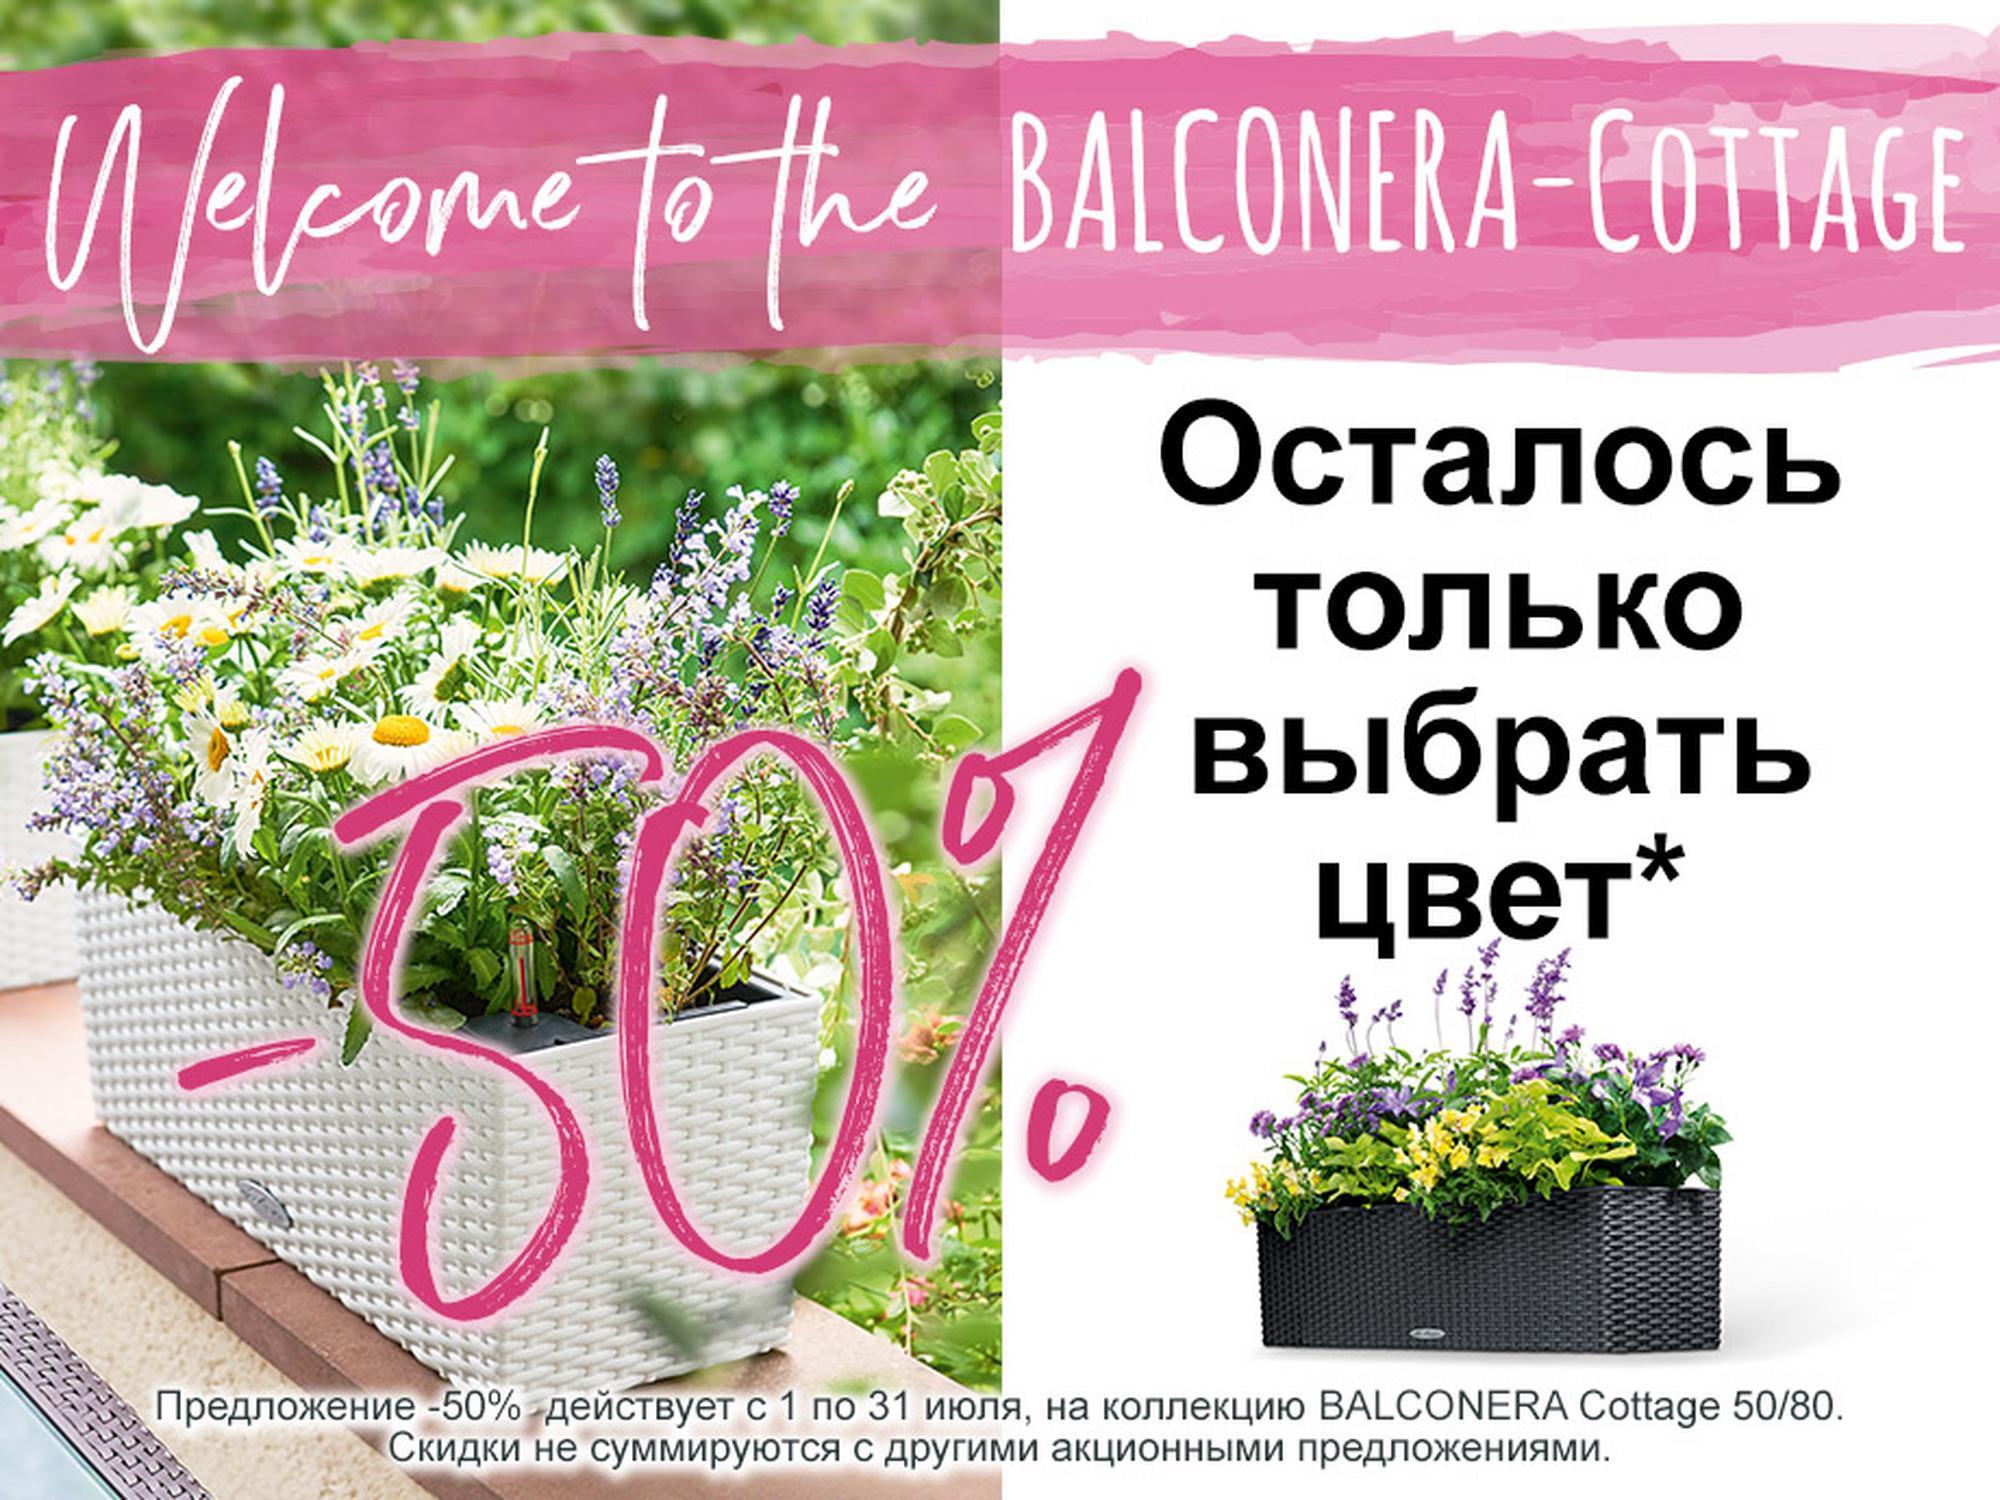 hero_banner_promo_blc-cot-2019_xs_ua